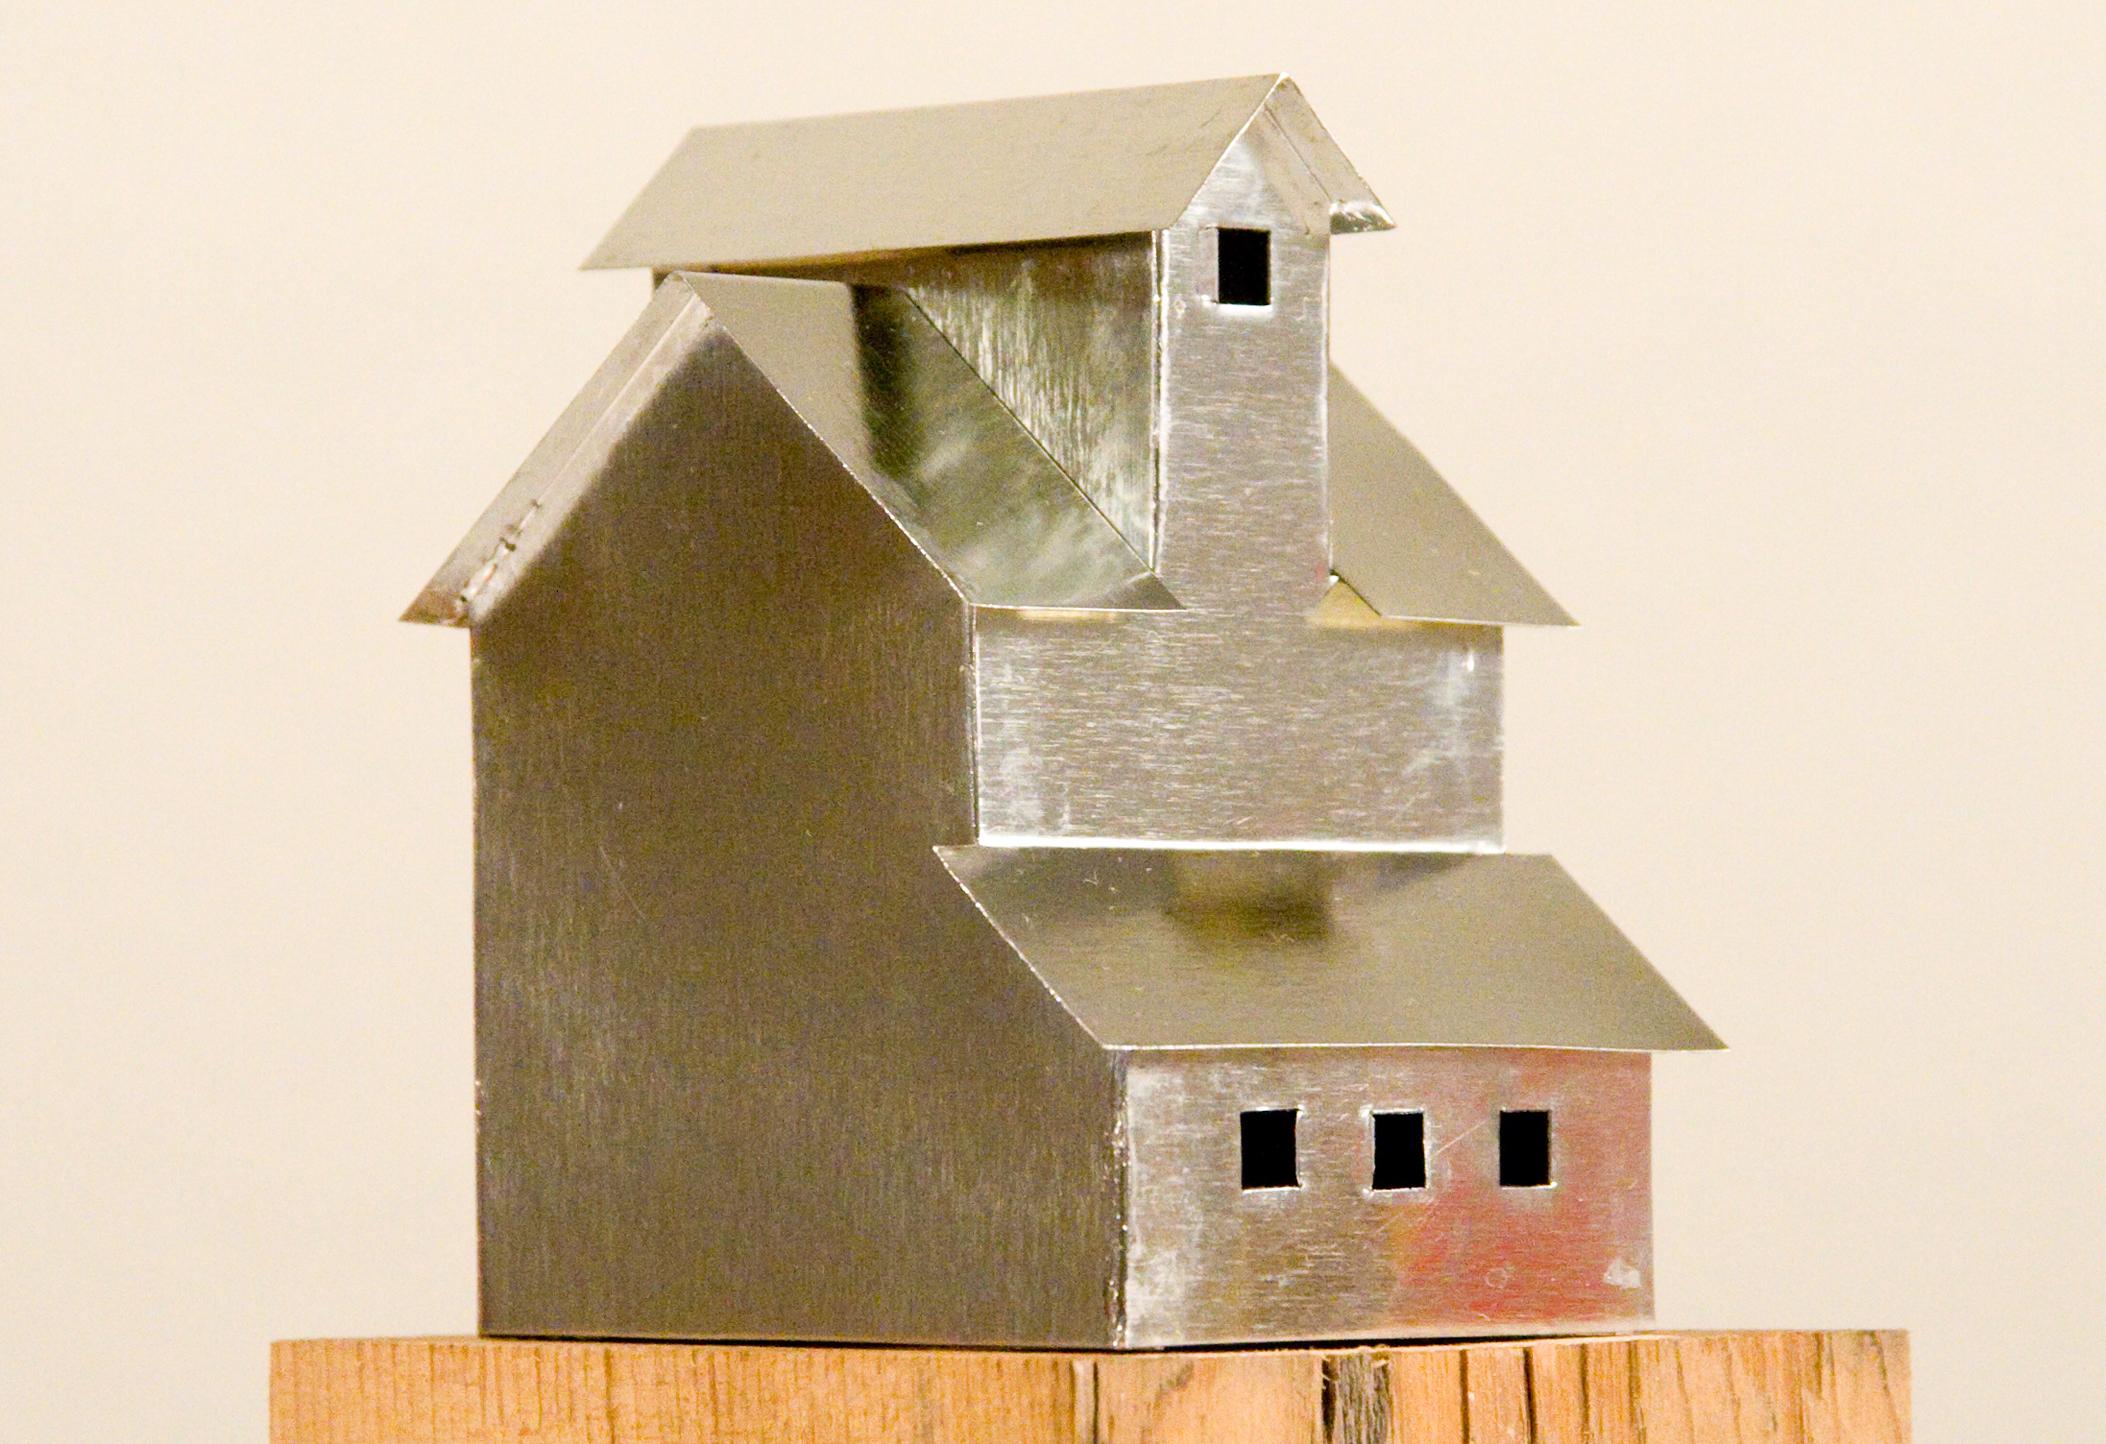 Tinplate Girl #7: Folding and forming tinplate